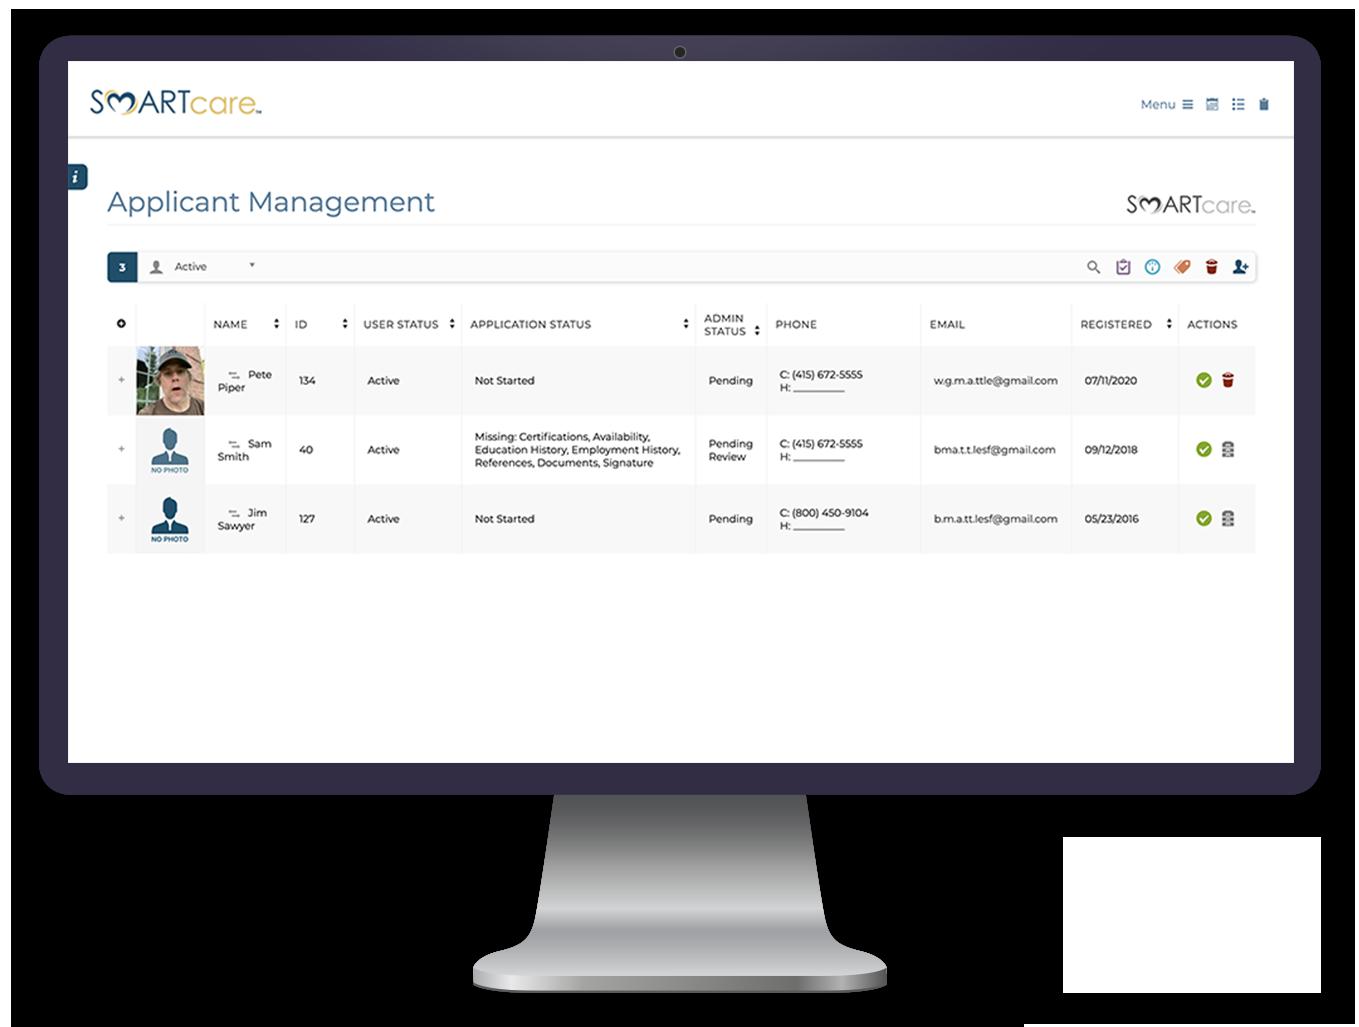 HR & Recruiters Management Software - SMARTcare